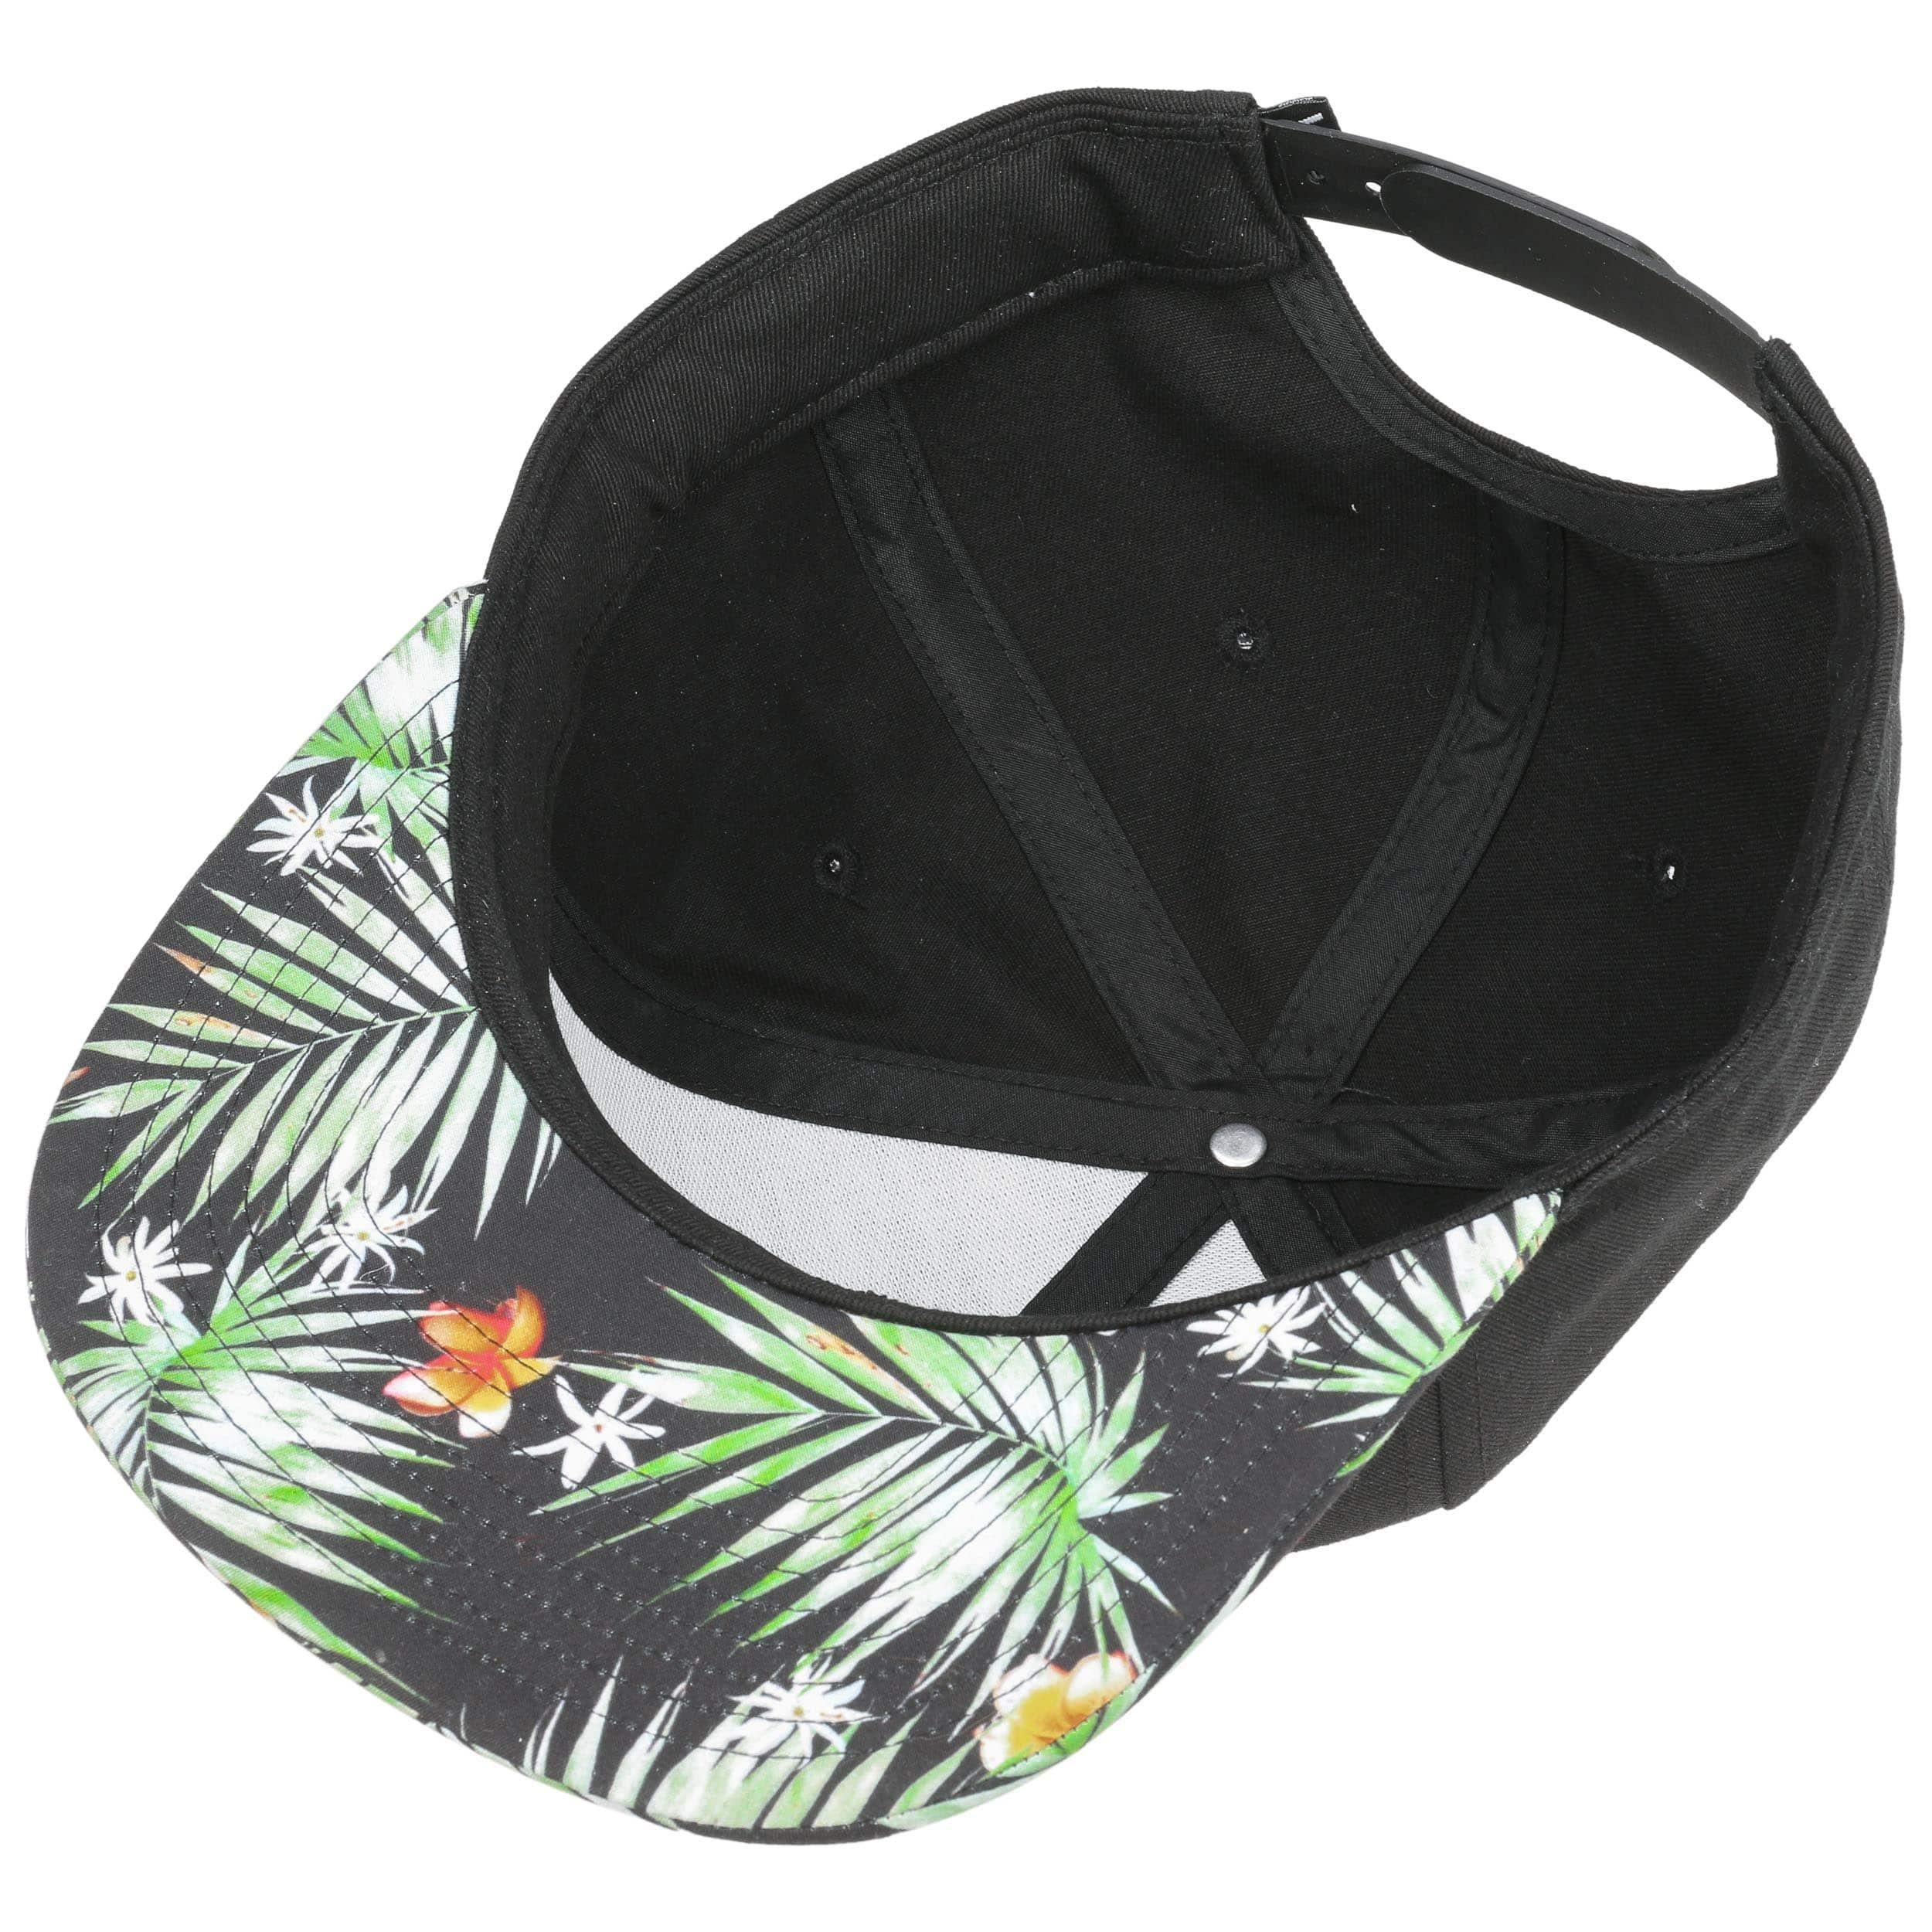 ... Allover It Snapback Cap by Vans - black 2 ... 09a9a3ef636